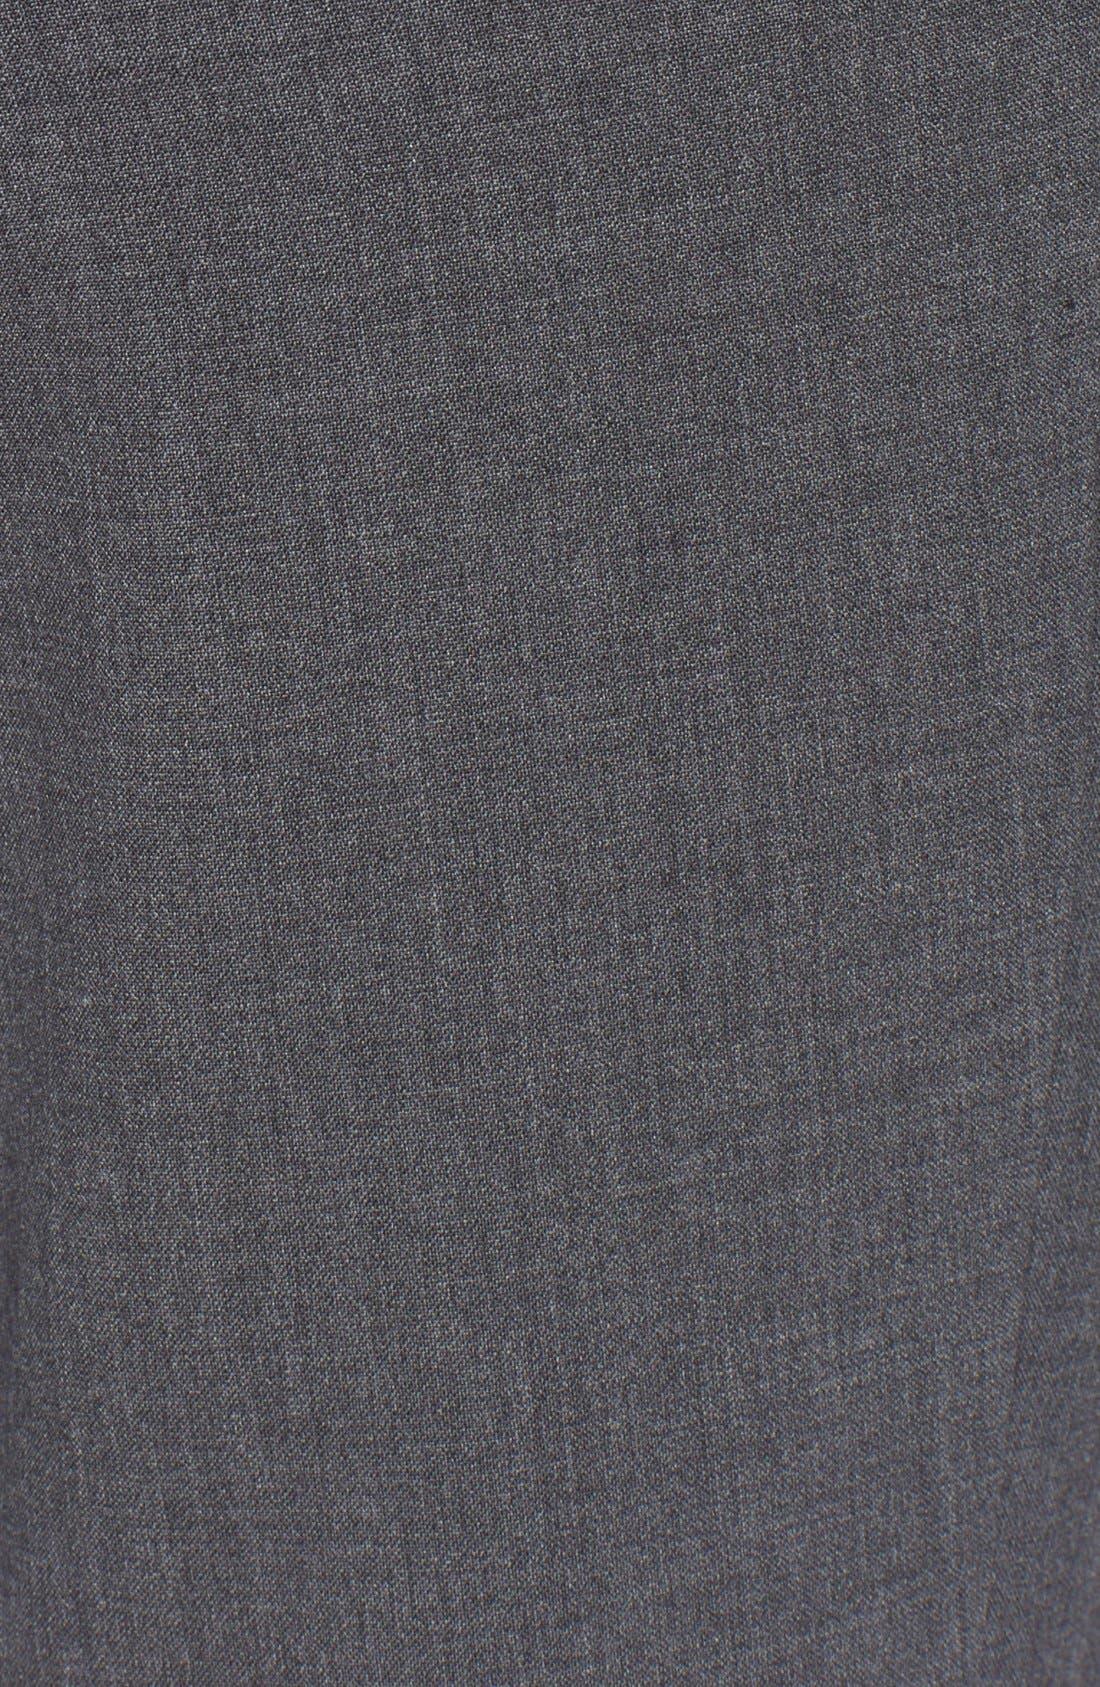 Alternate Image 3  - Theory 'Super Slim Edition' Stretch Wool Pants